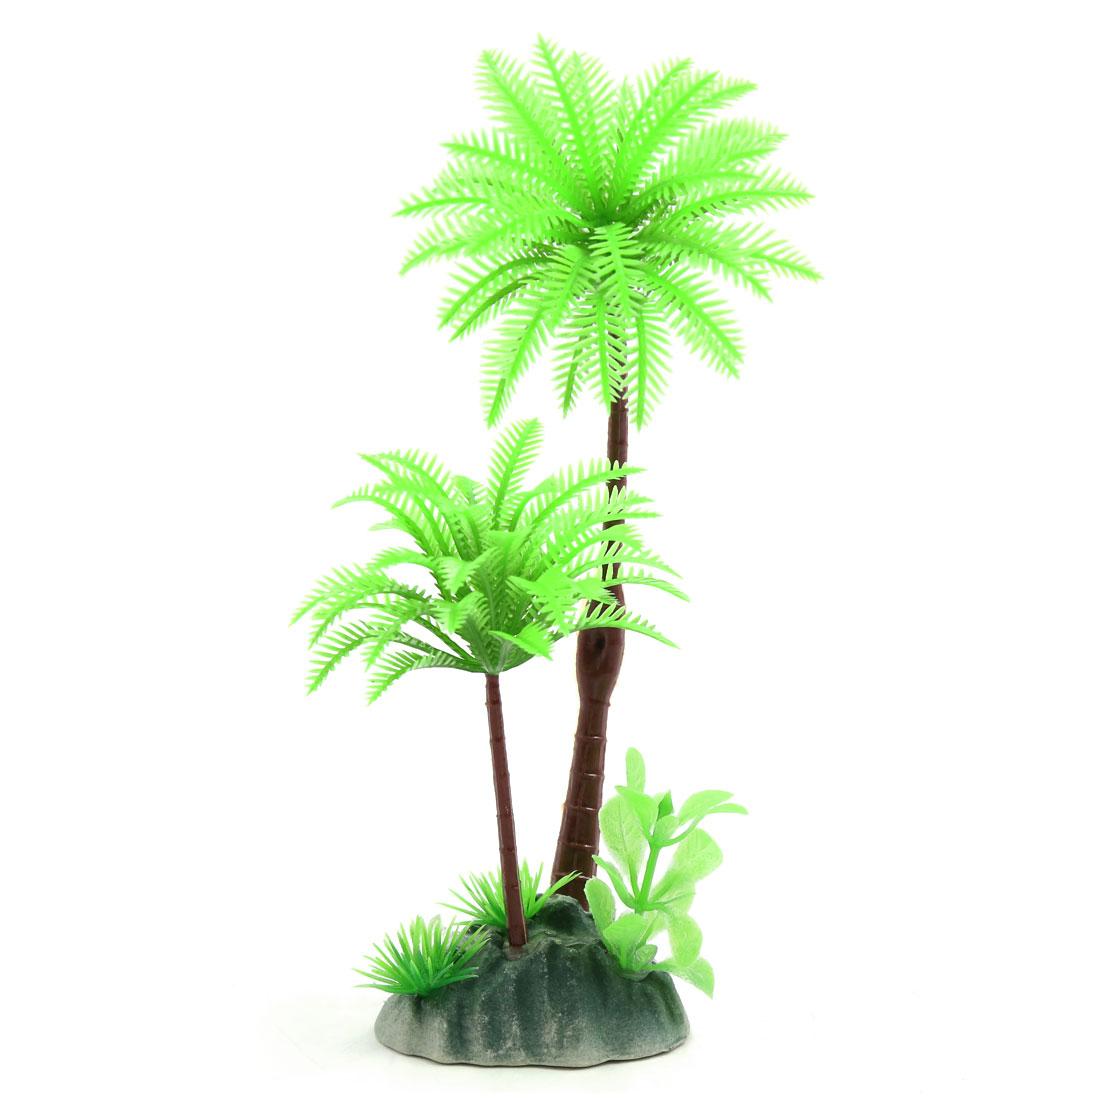 Plastic Coconut Tree Terrarium Tank Ornament for Reptiles Amphibians Lizards